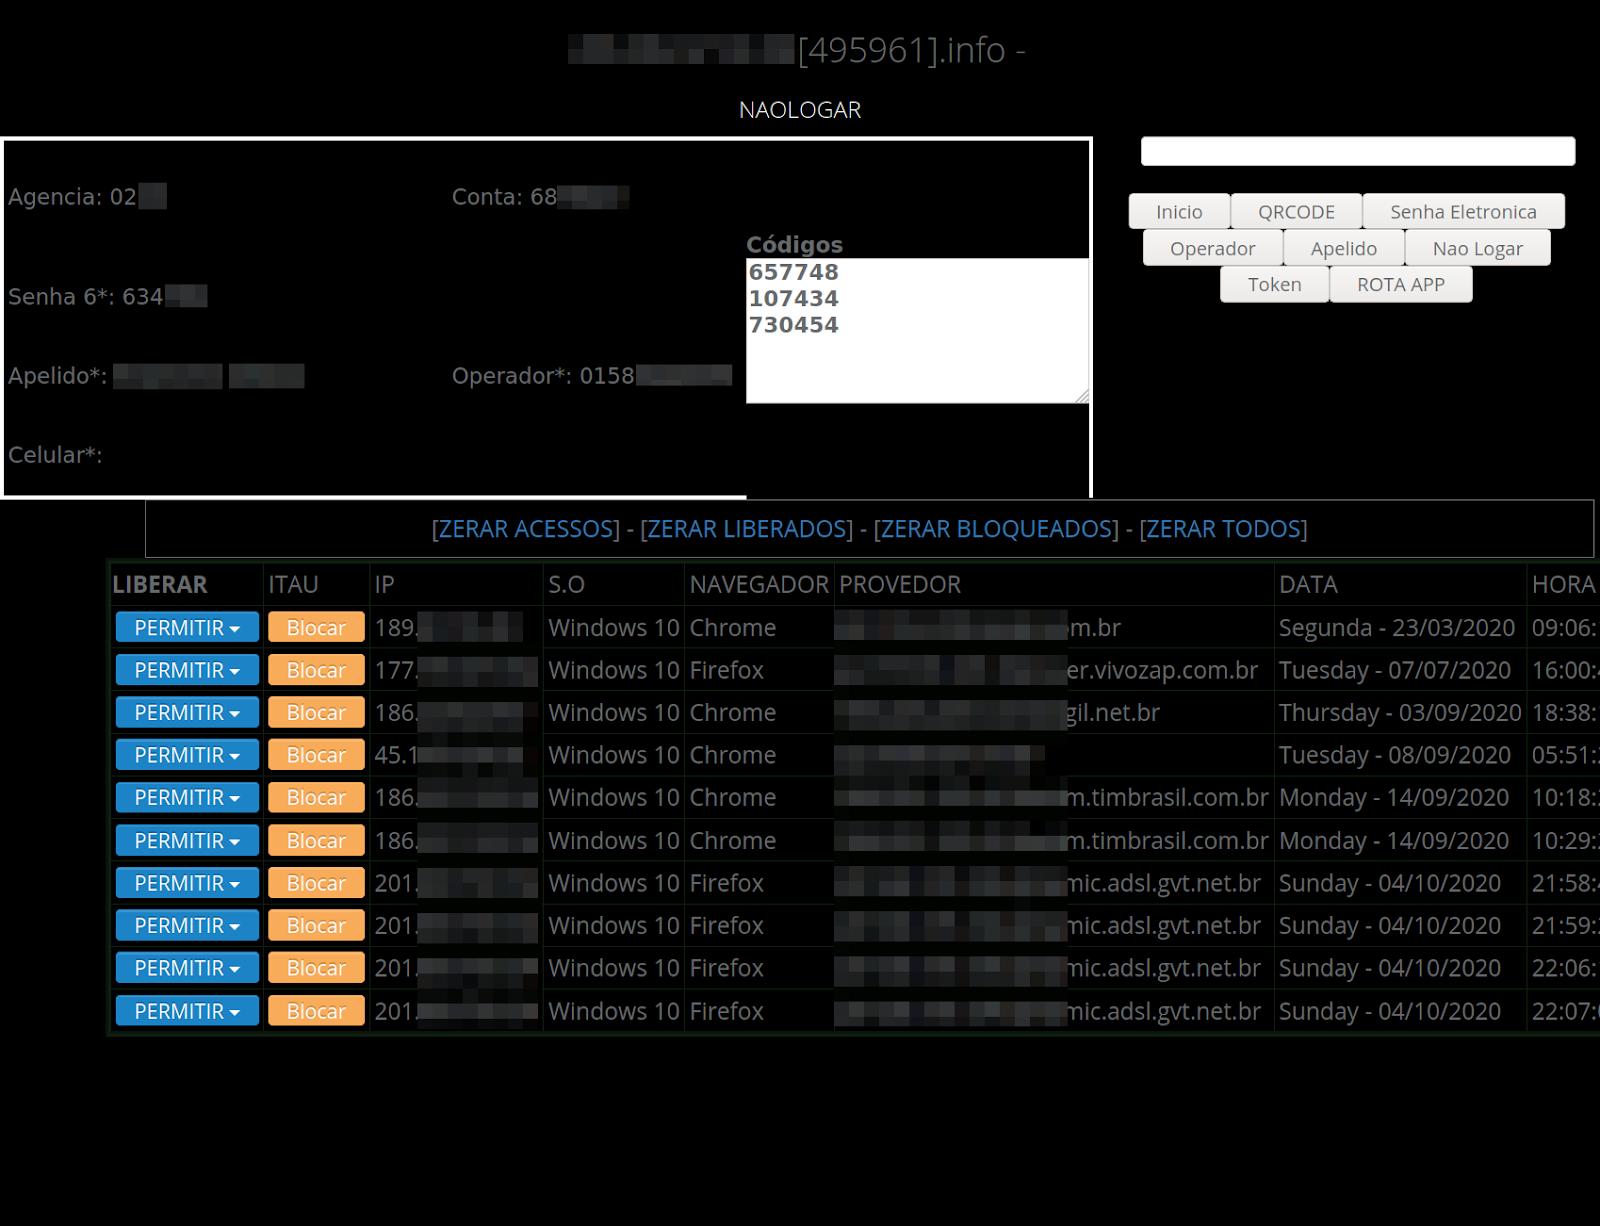 Phishing panel as seen by hacker